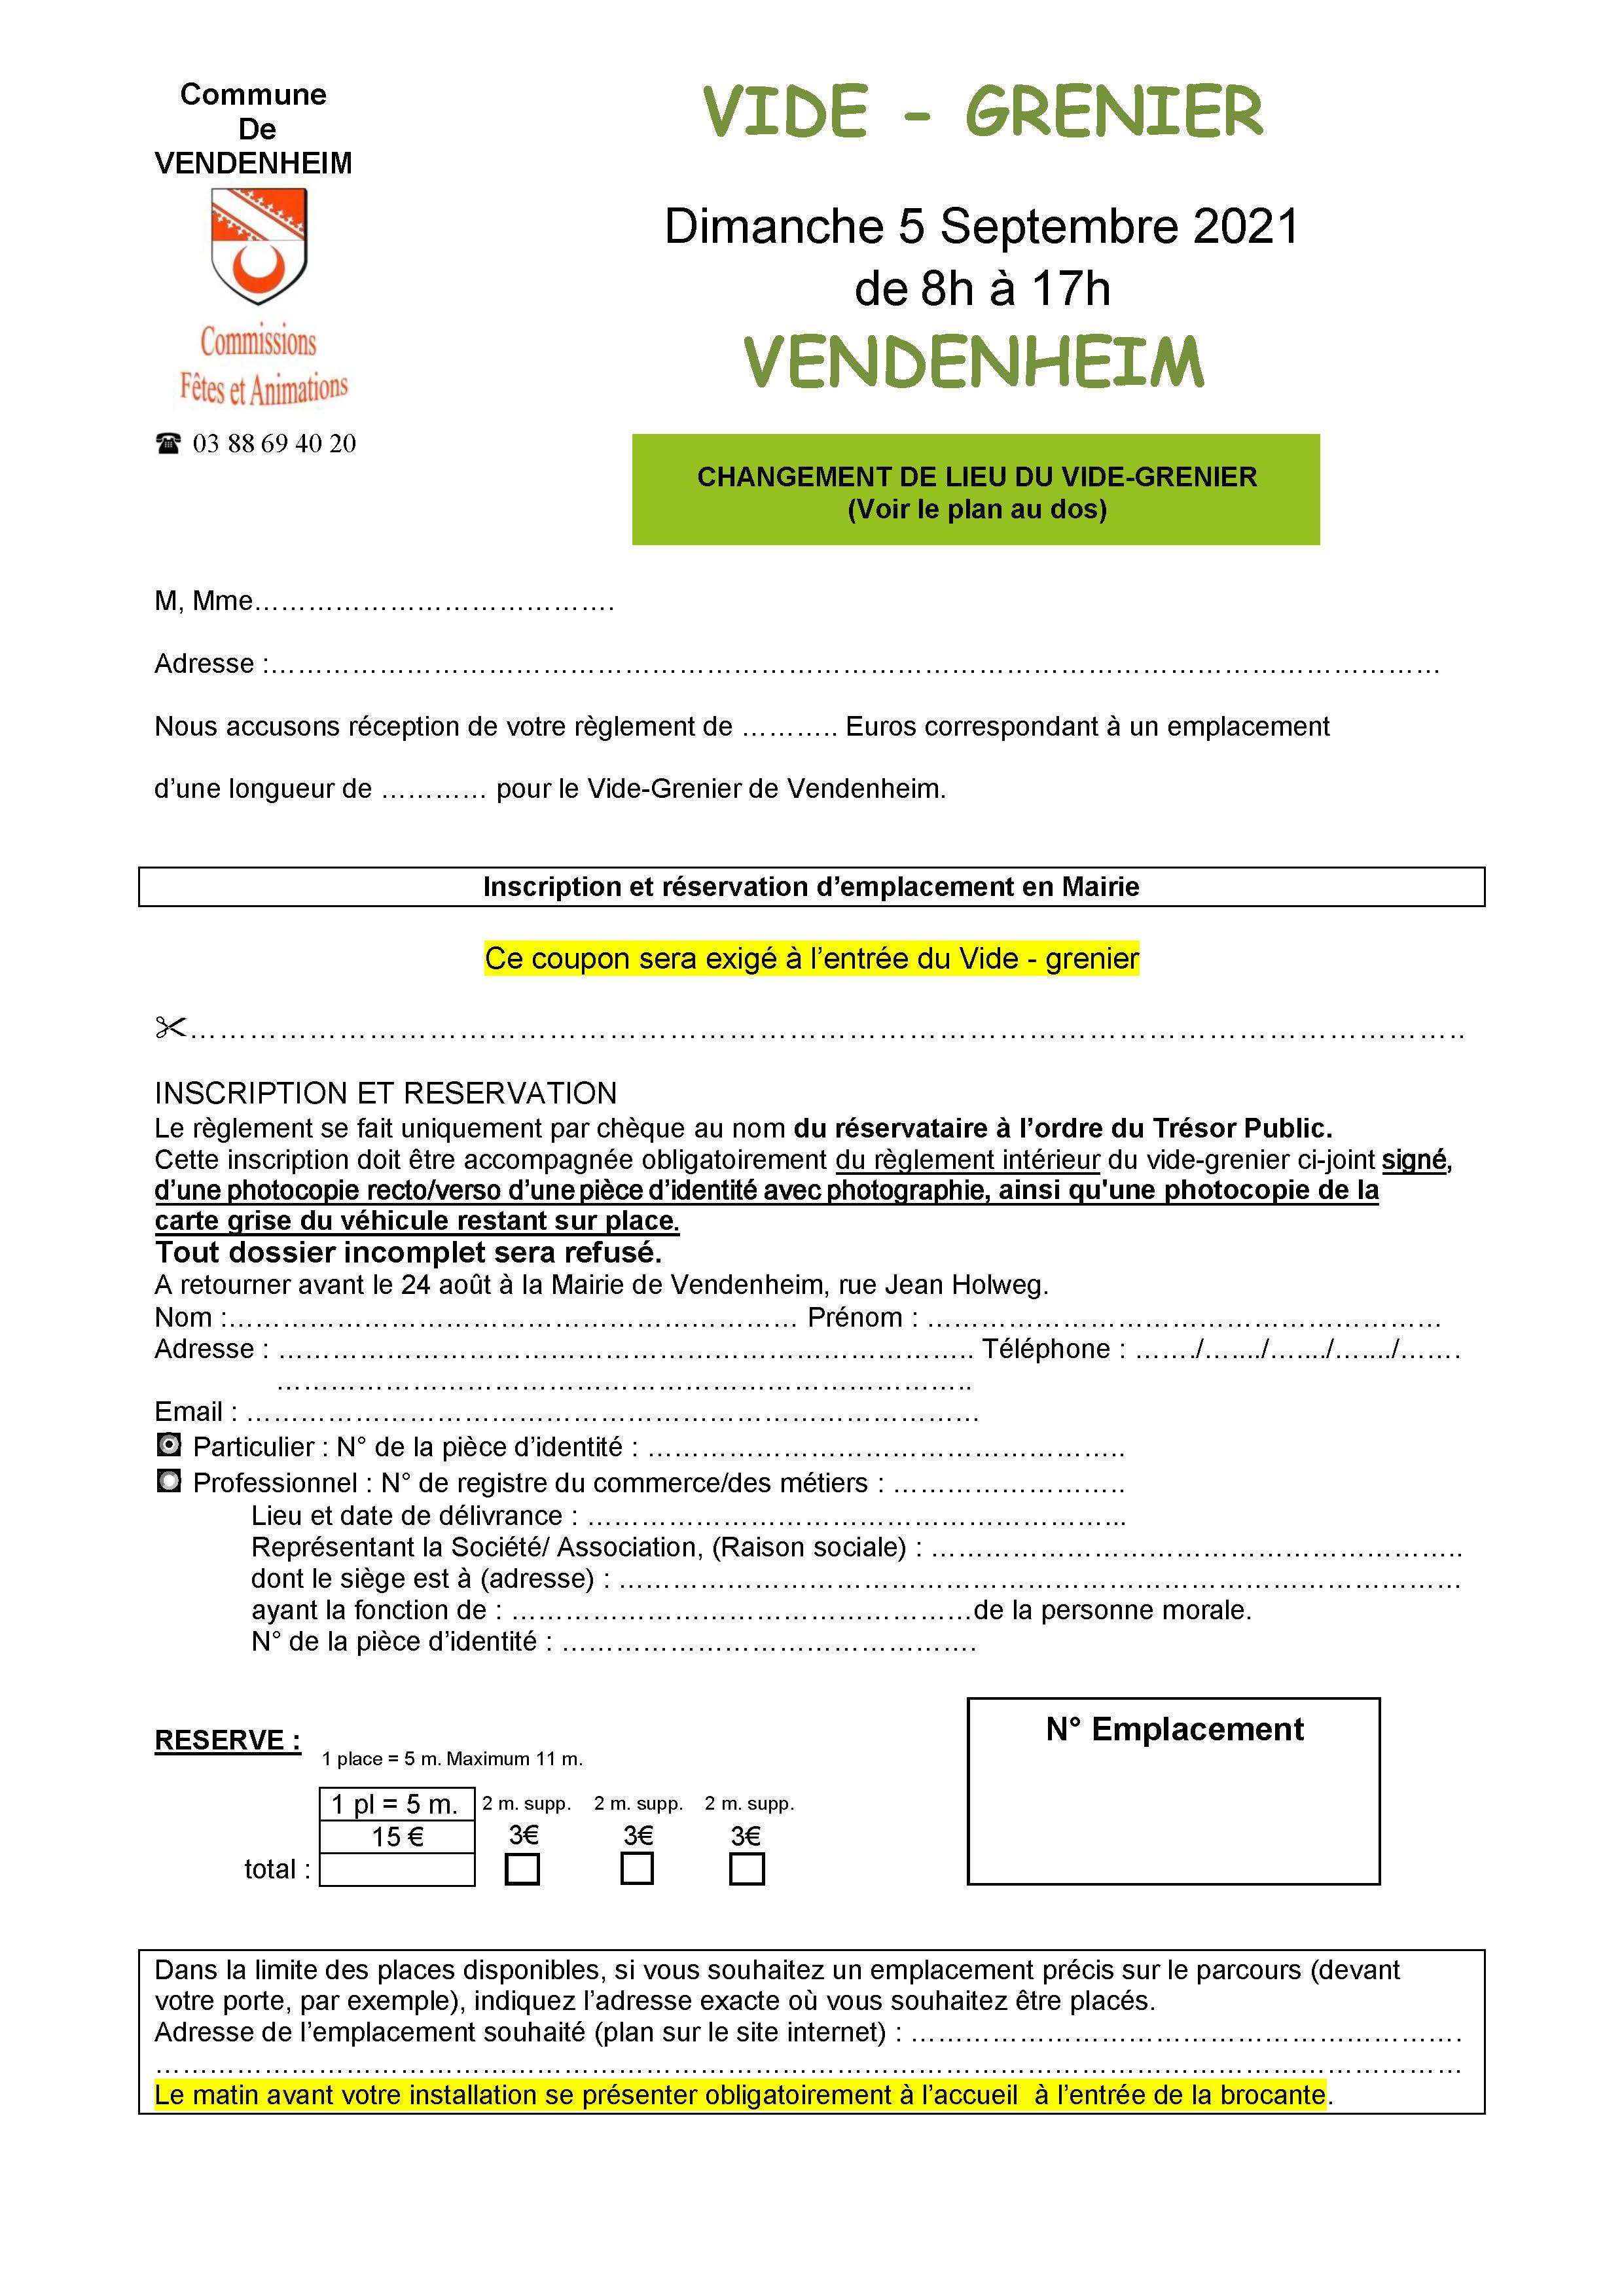 Vide Grenier inscription 2021_form_Page_1